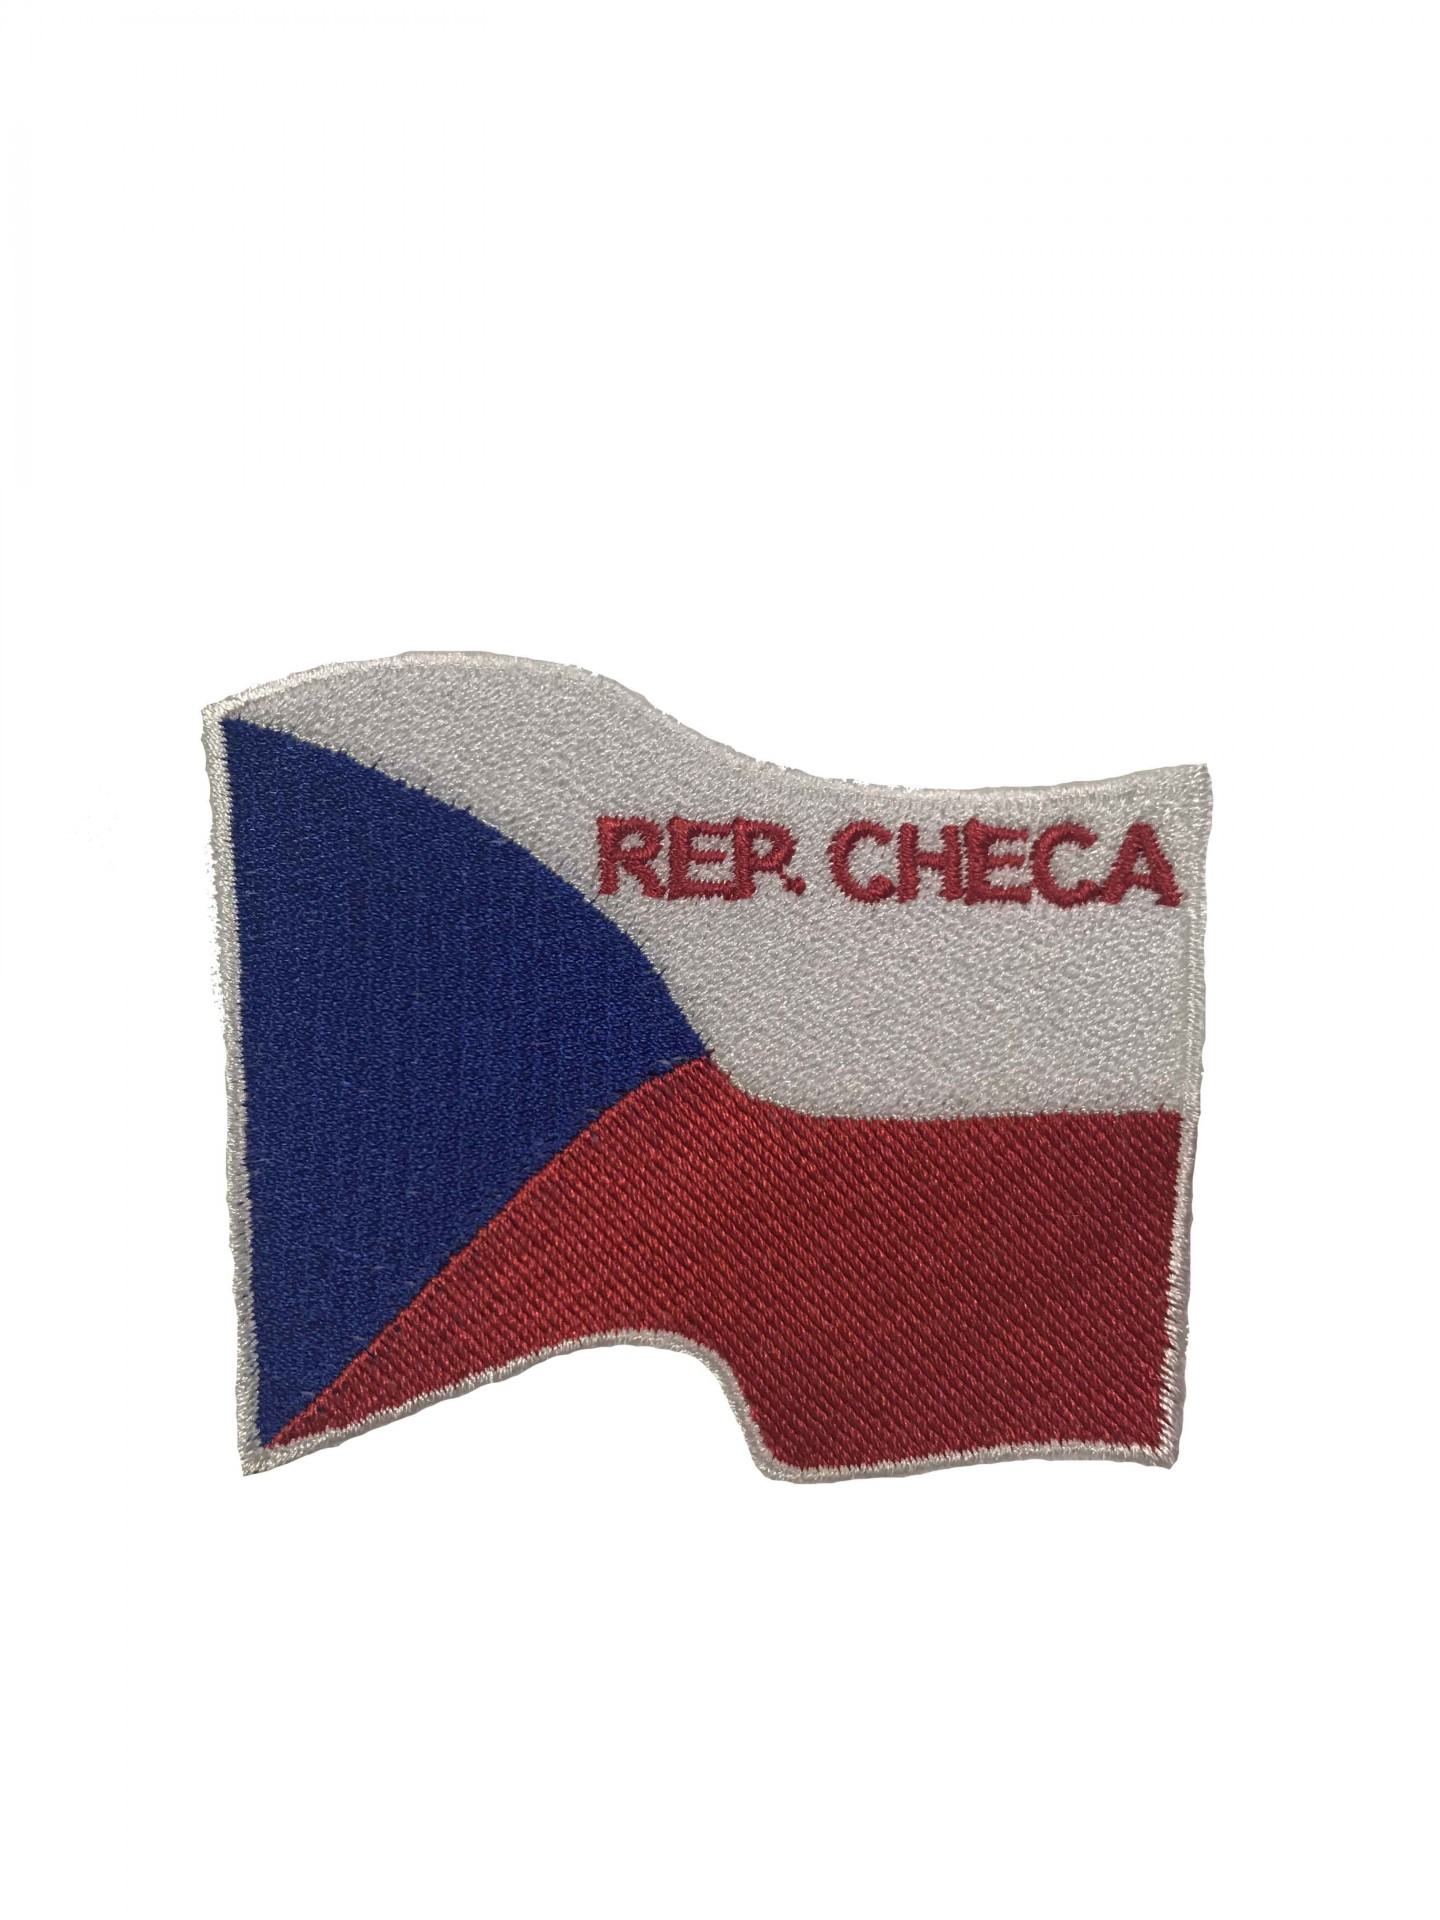 Emblema República Checa